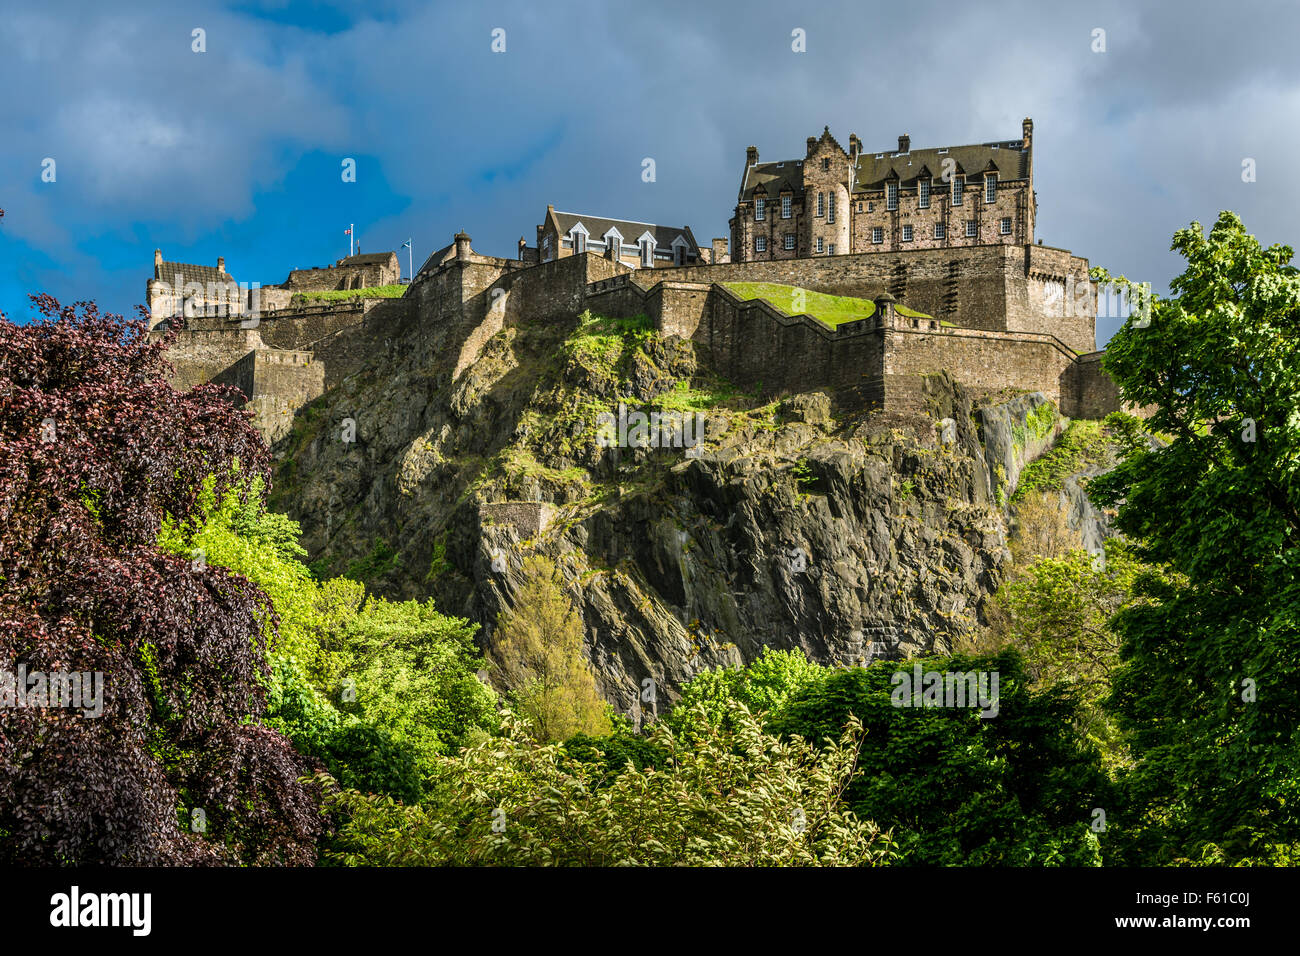 The North Walls of Edinburgh Castle, Scotland Stock Photo